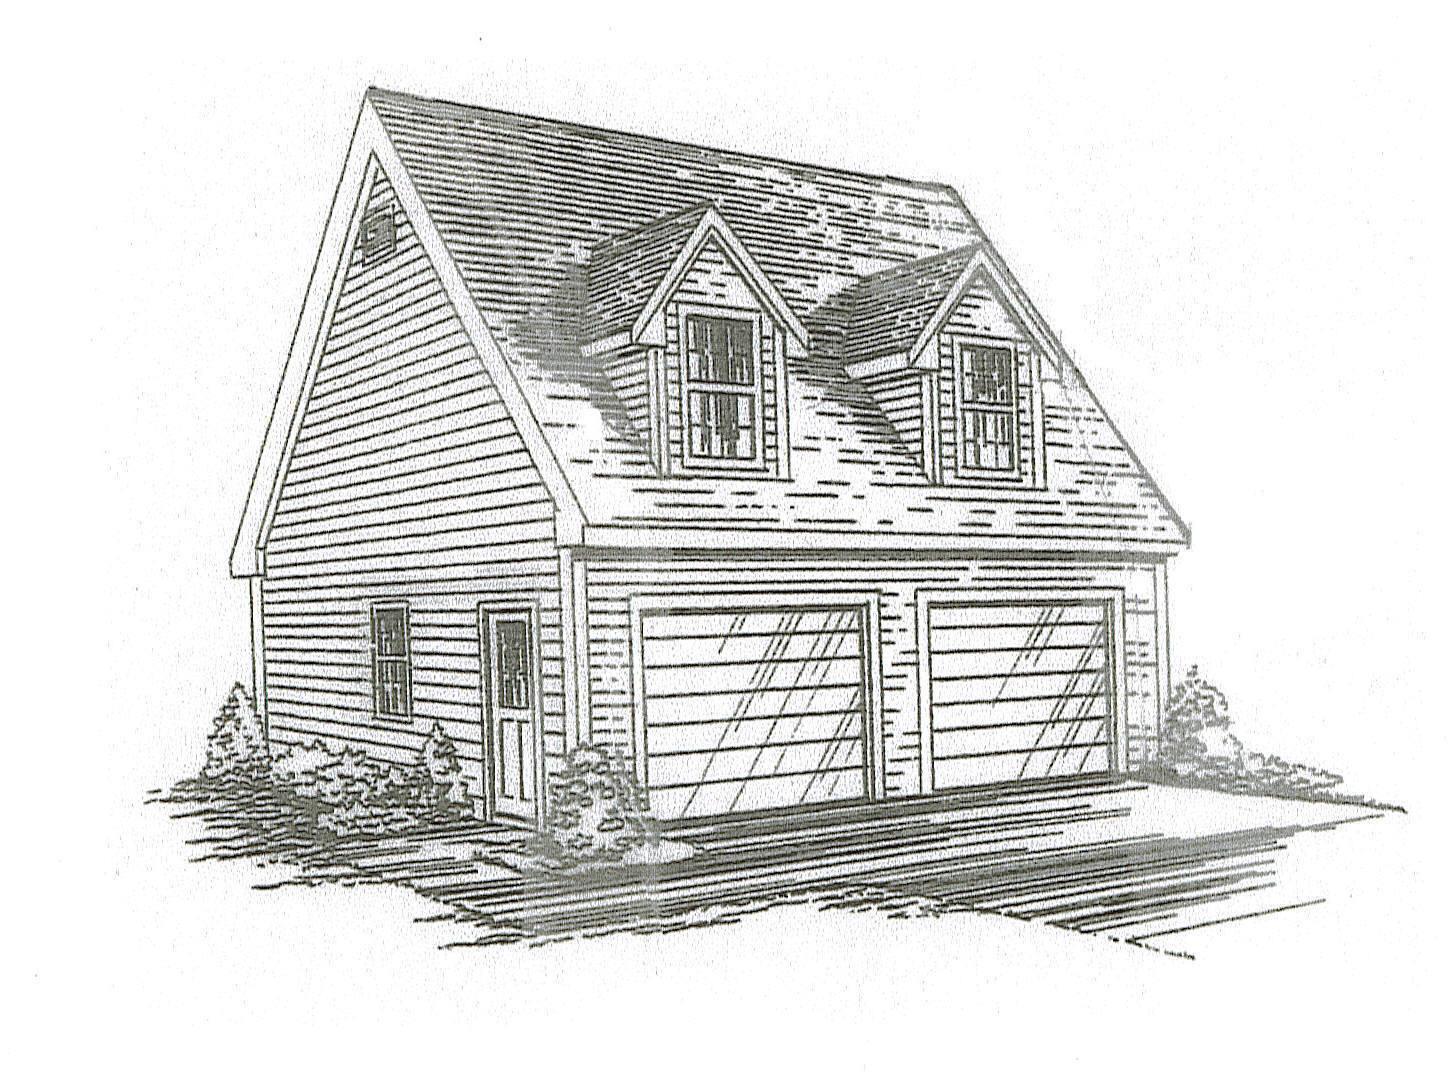 26 x x x 26 2 Car TD / LD Garage Building Blauprint Plans / Walk up Loft fb759a